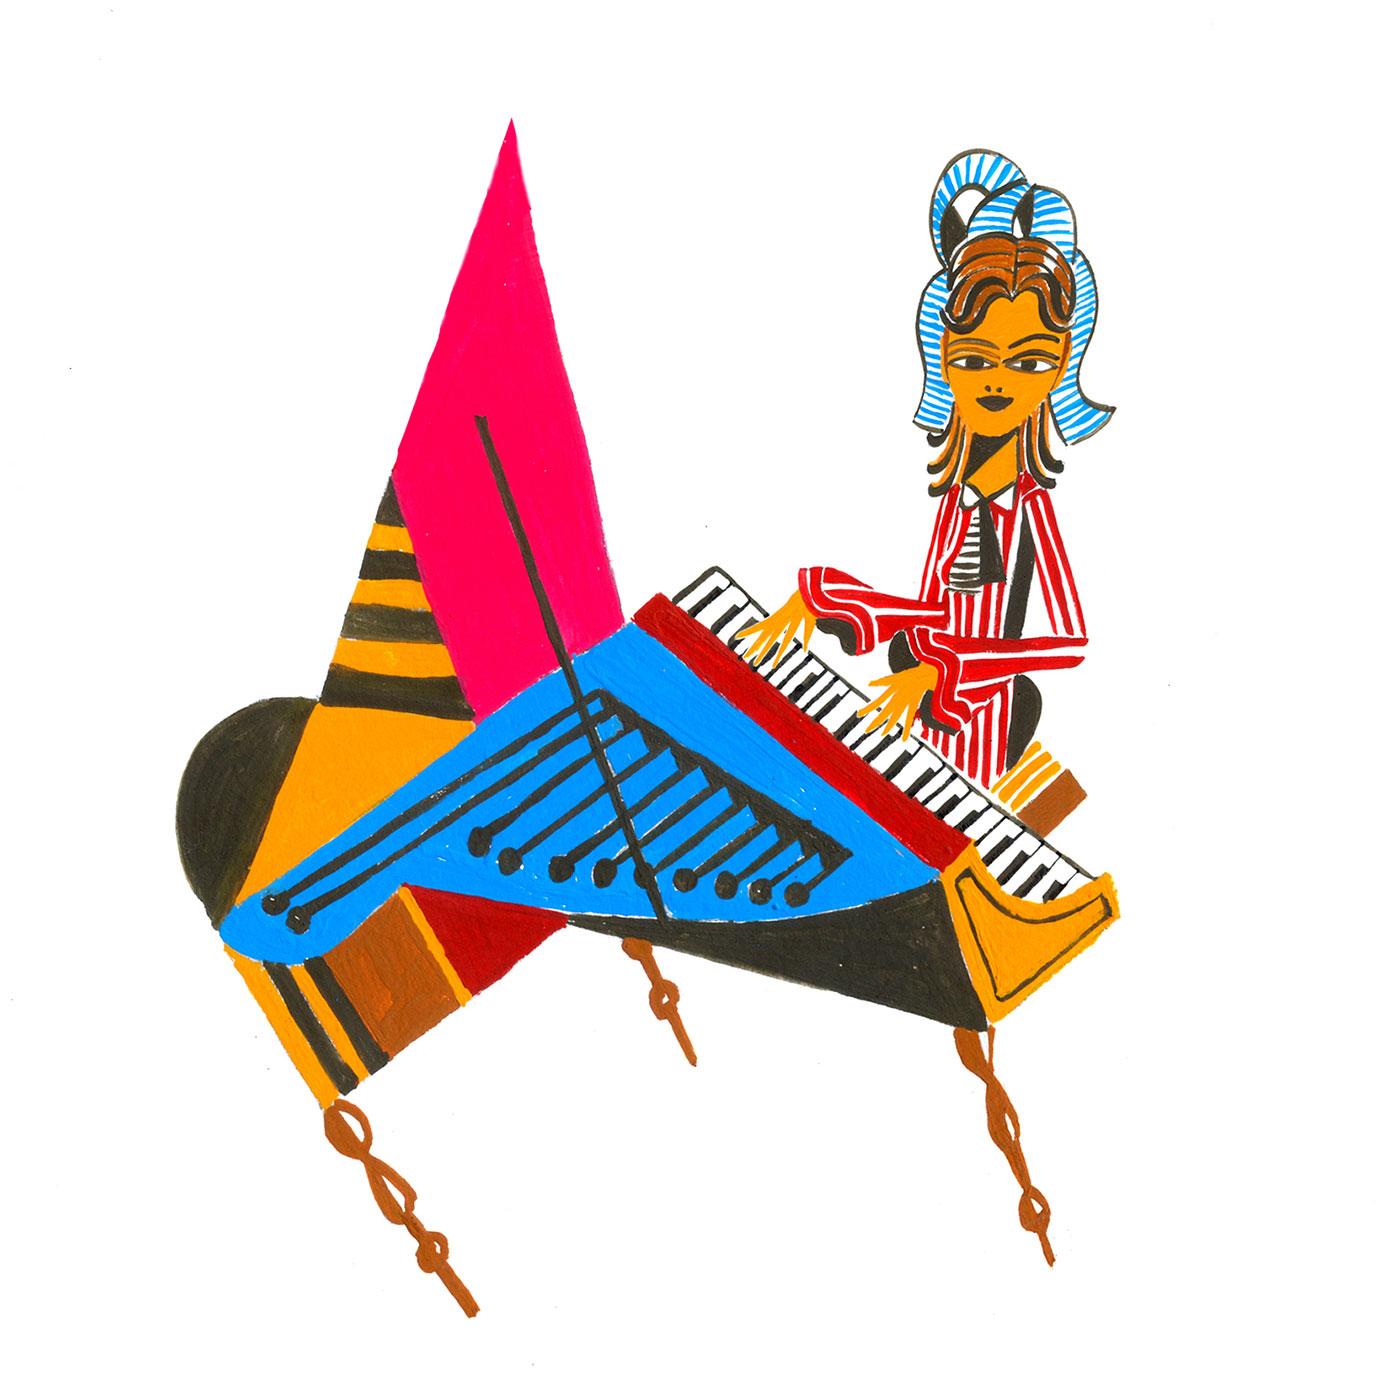 chiquinha-002_facebook 2_mulher pianista